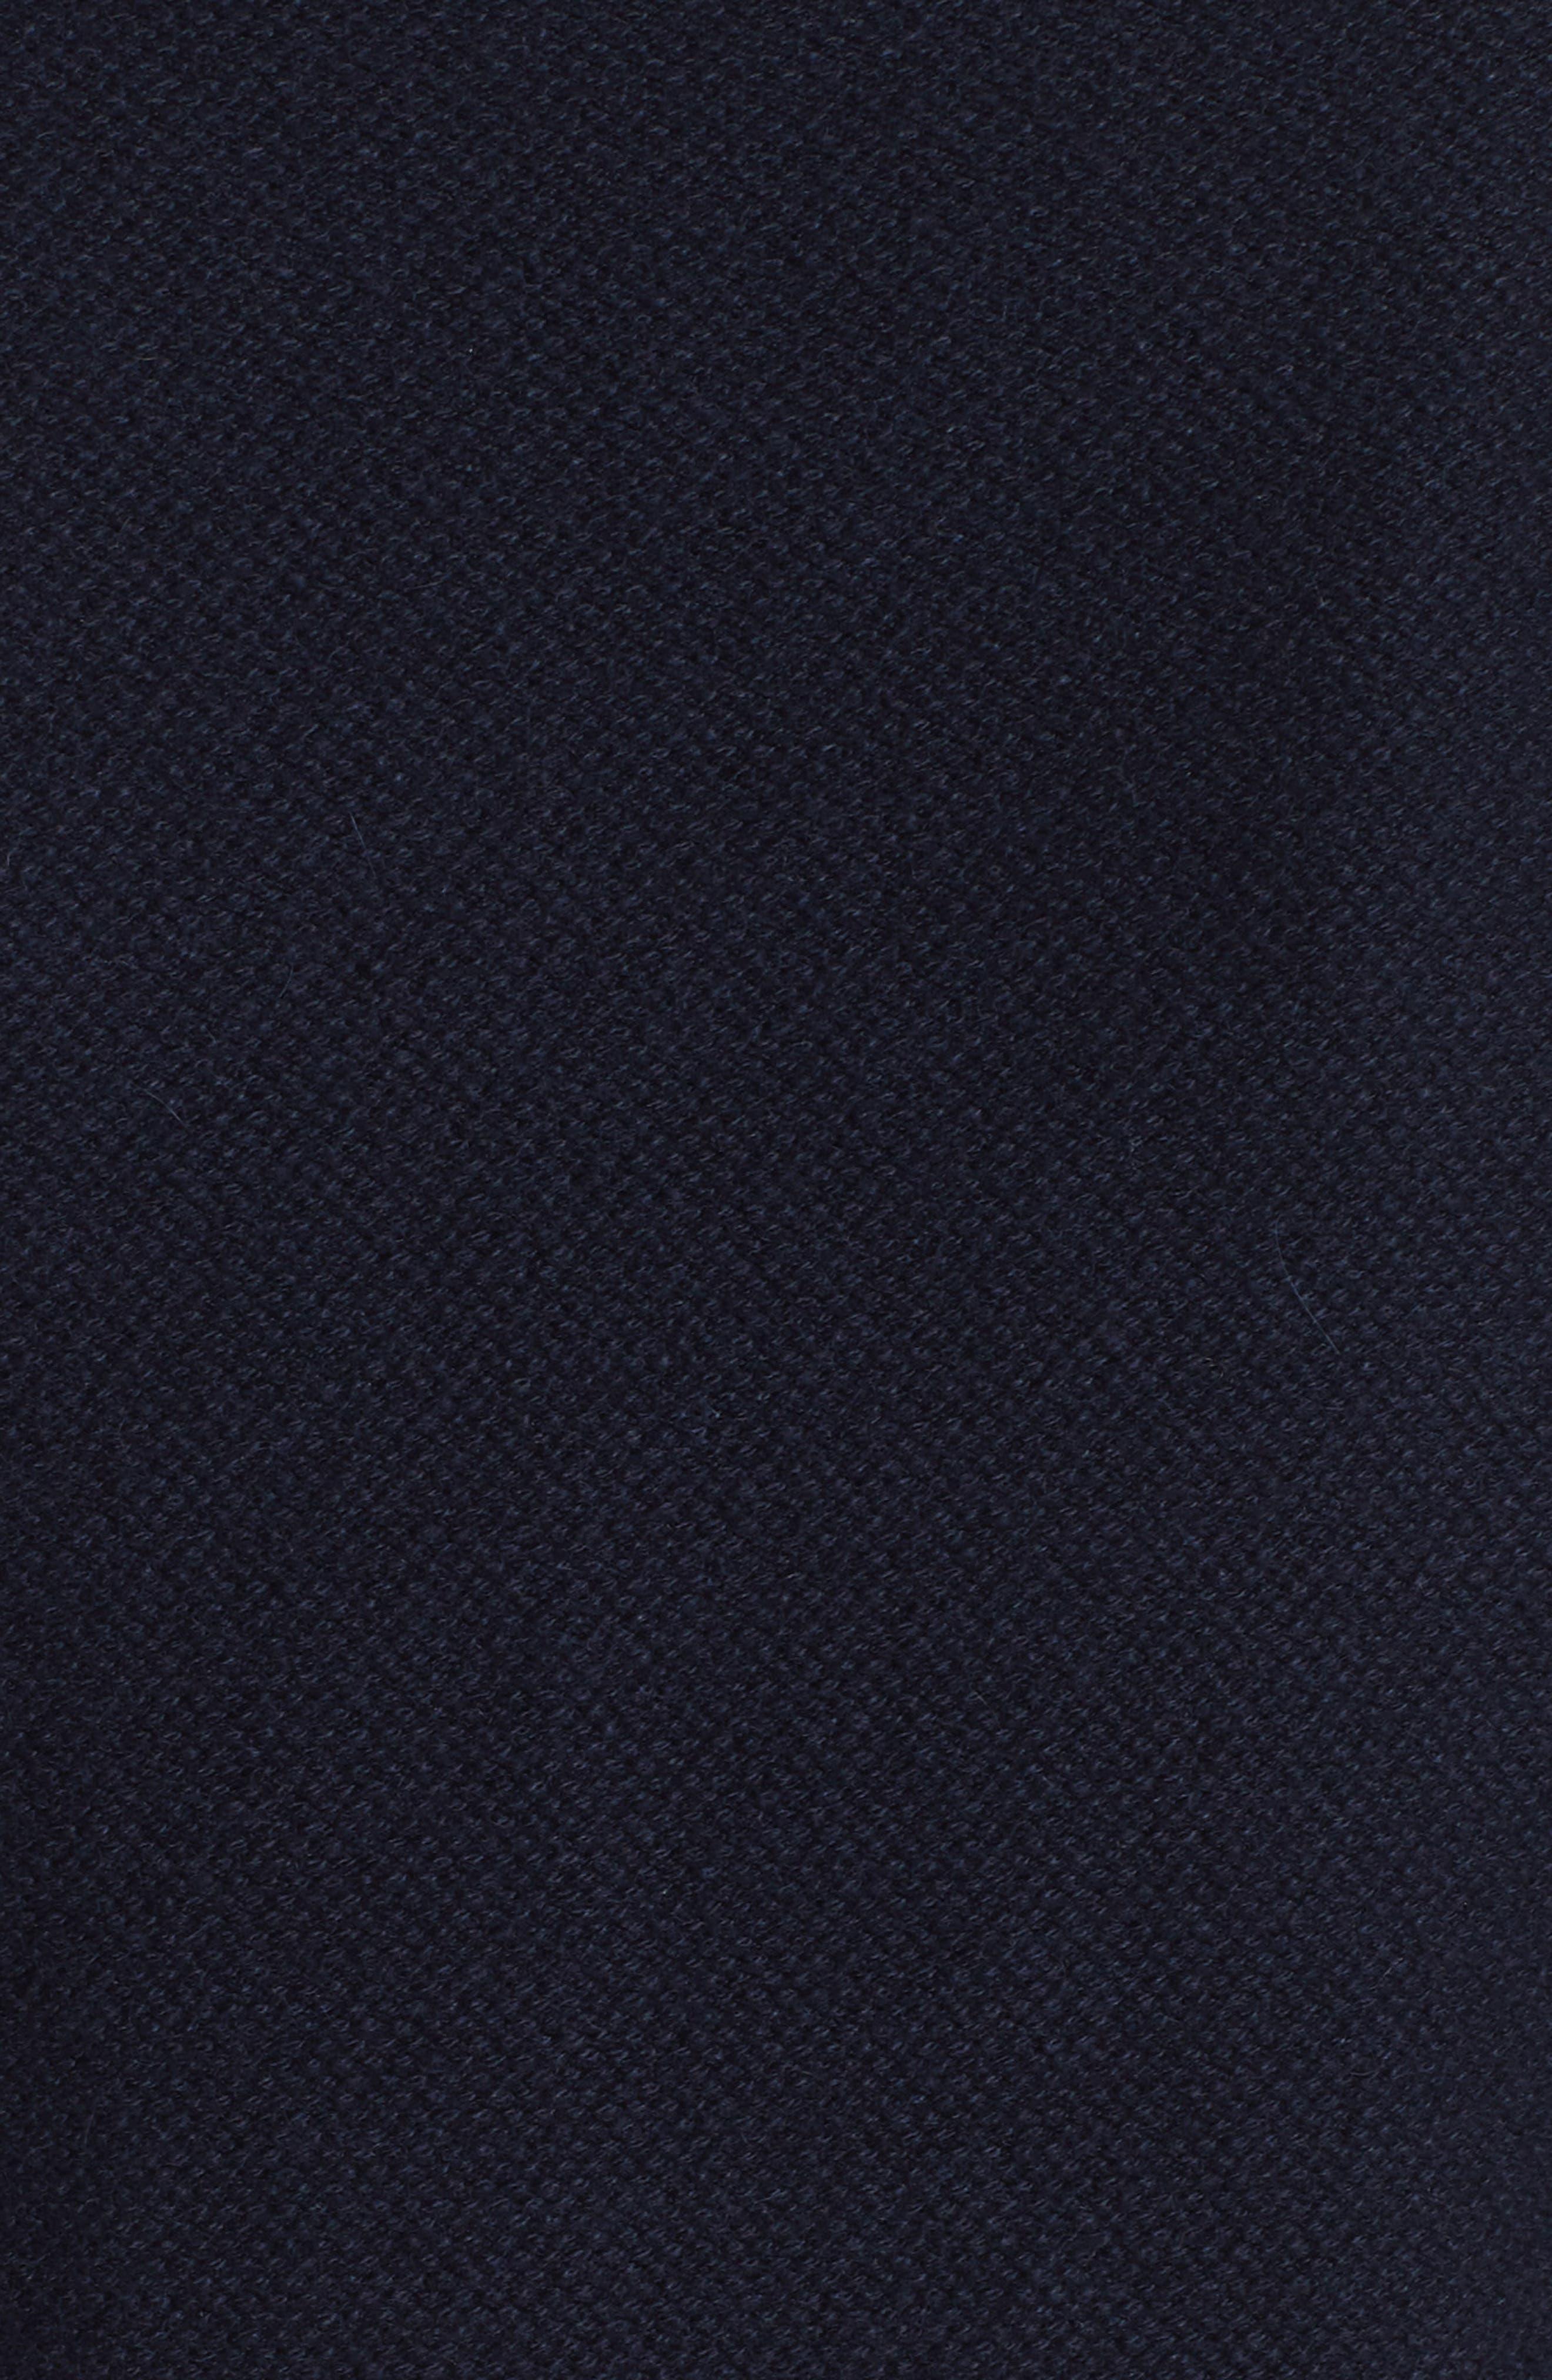 Cashmere Raglan Sweater,                             Alternate thumbnail 6, color,                             NAVY